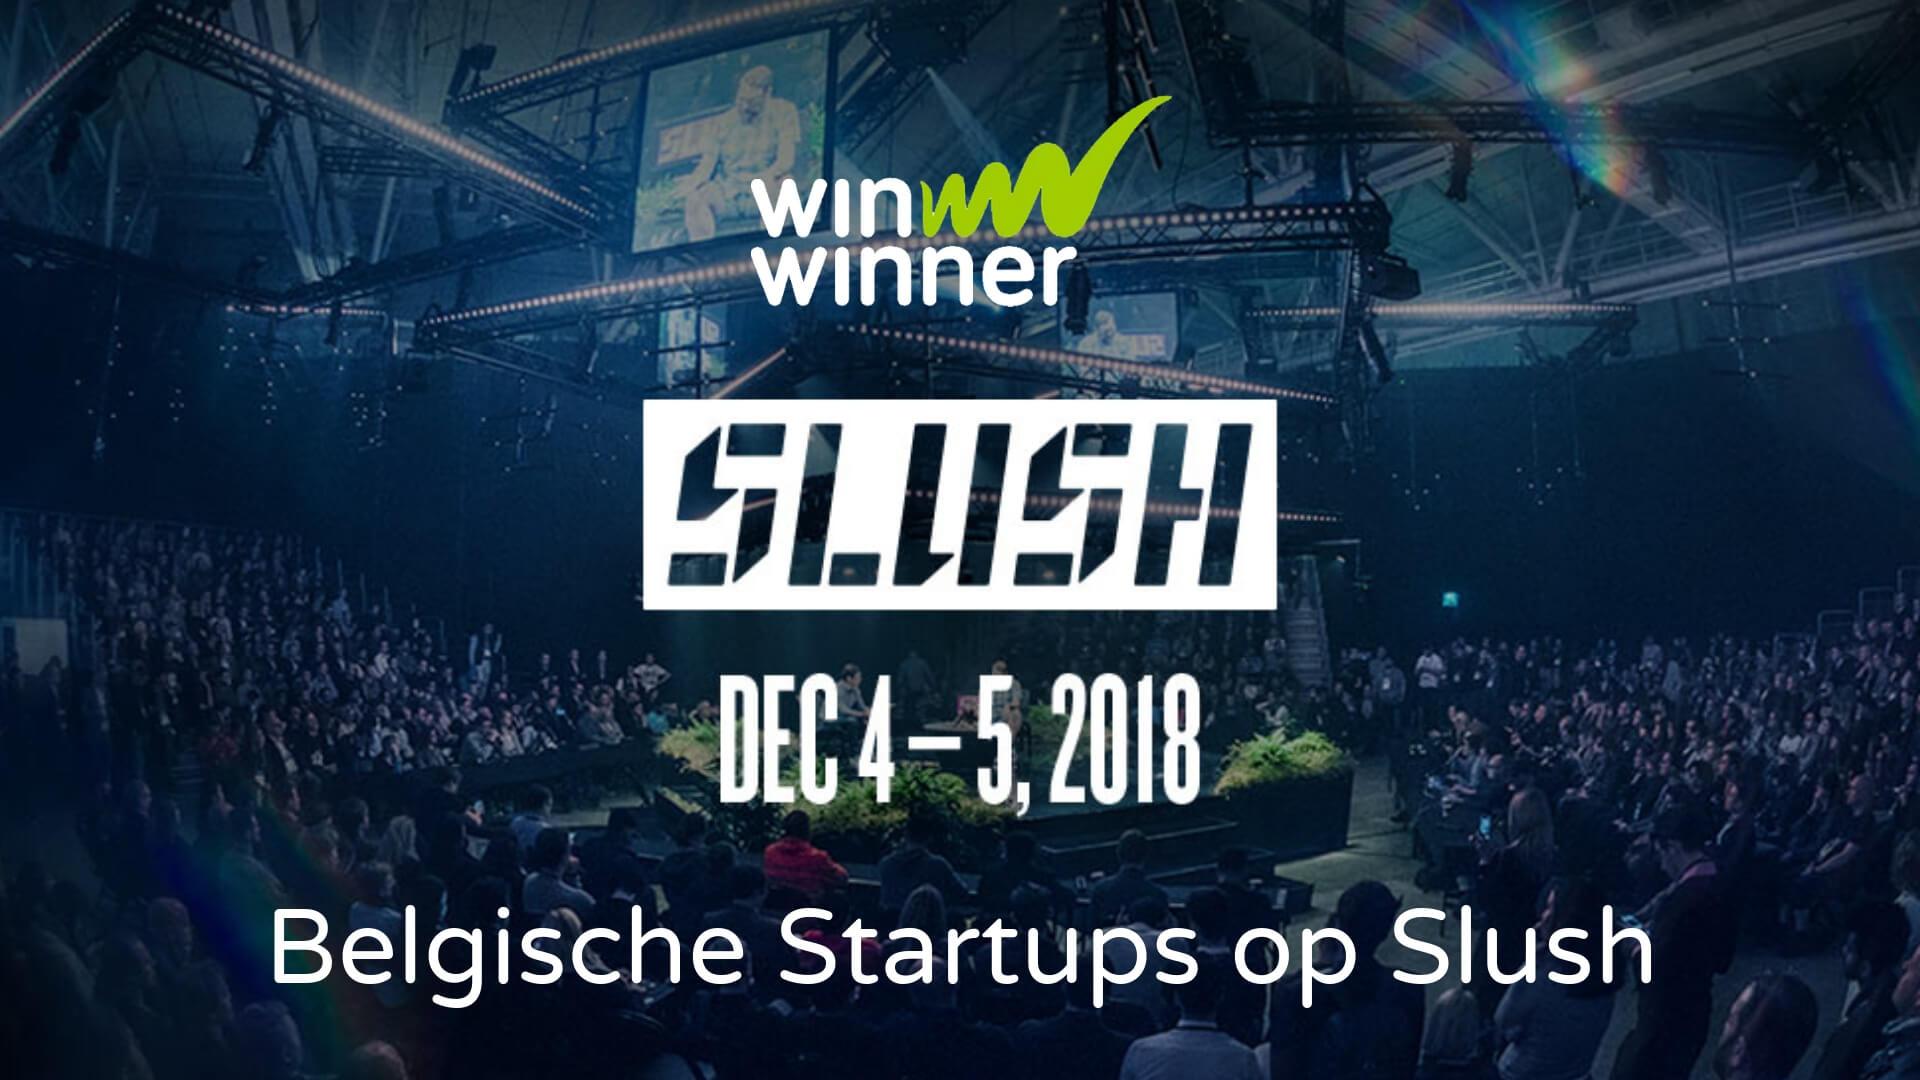 WinWinner @ Slush: Episode 2 - Belgische Startups op Slush